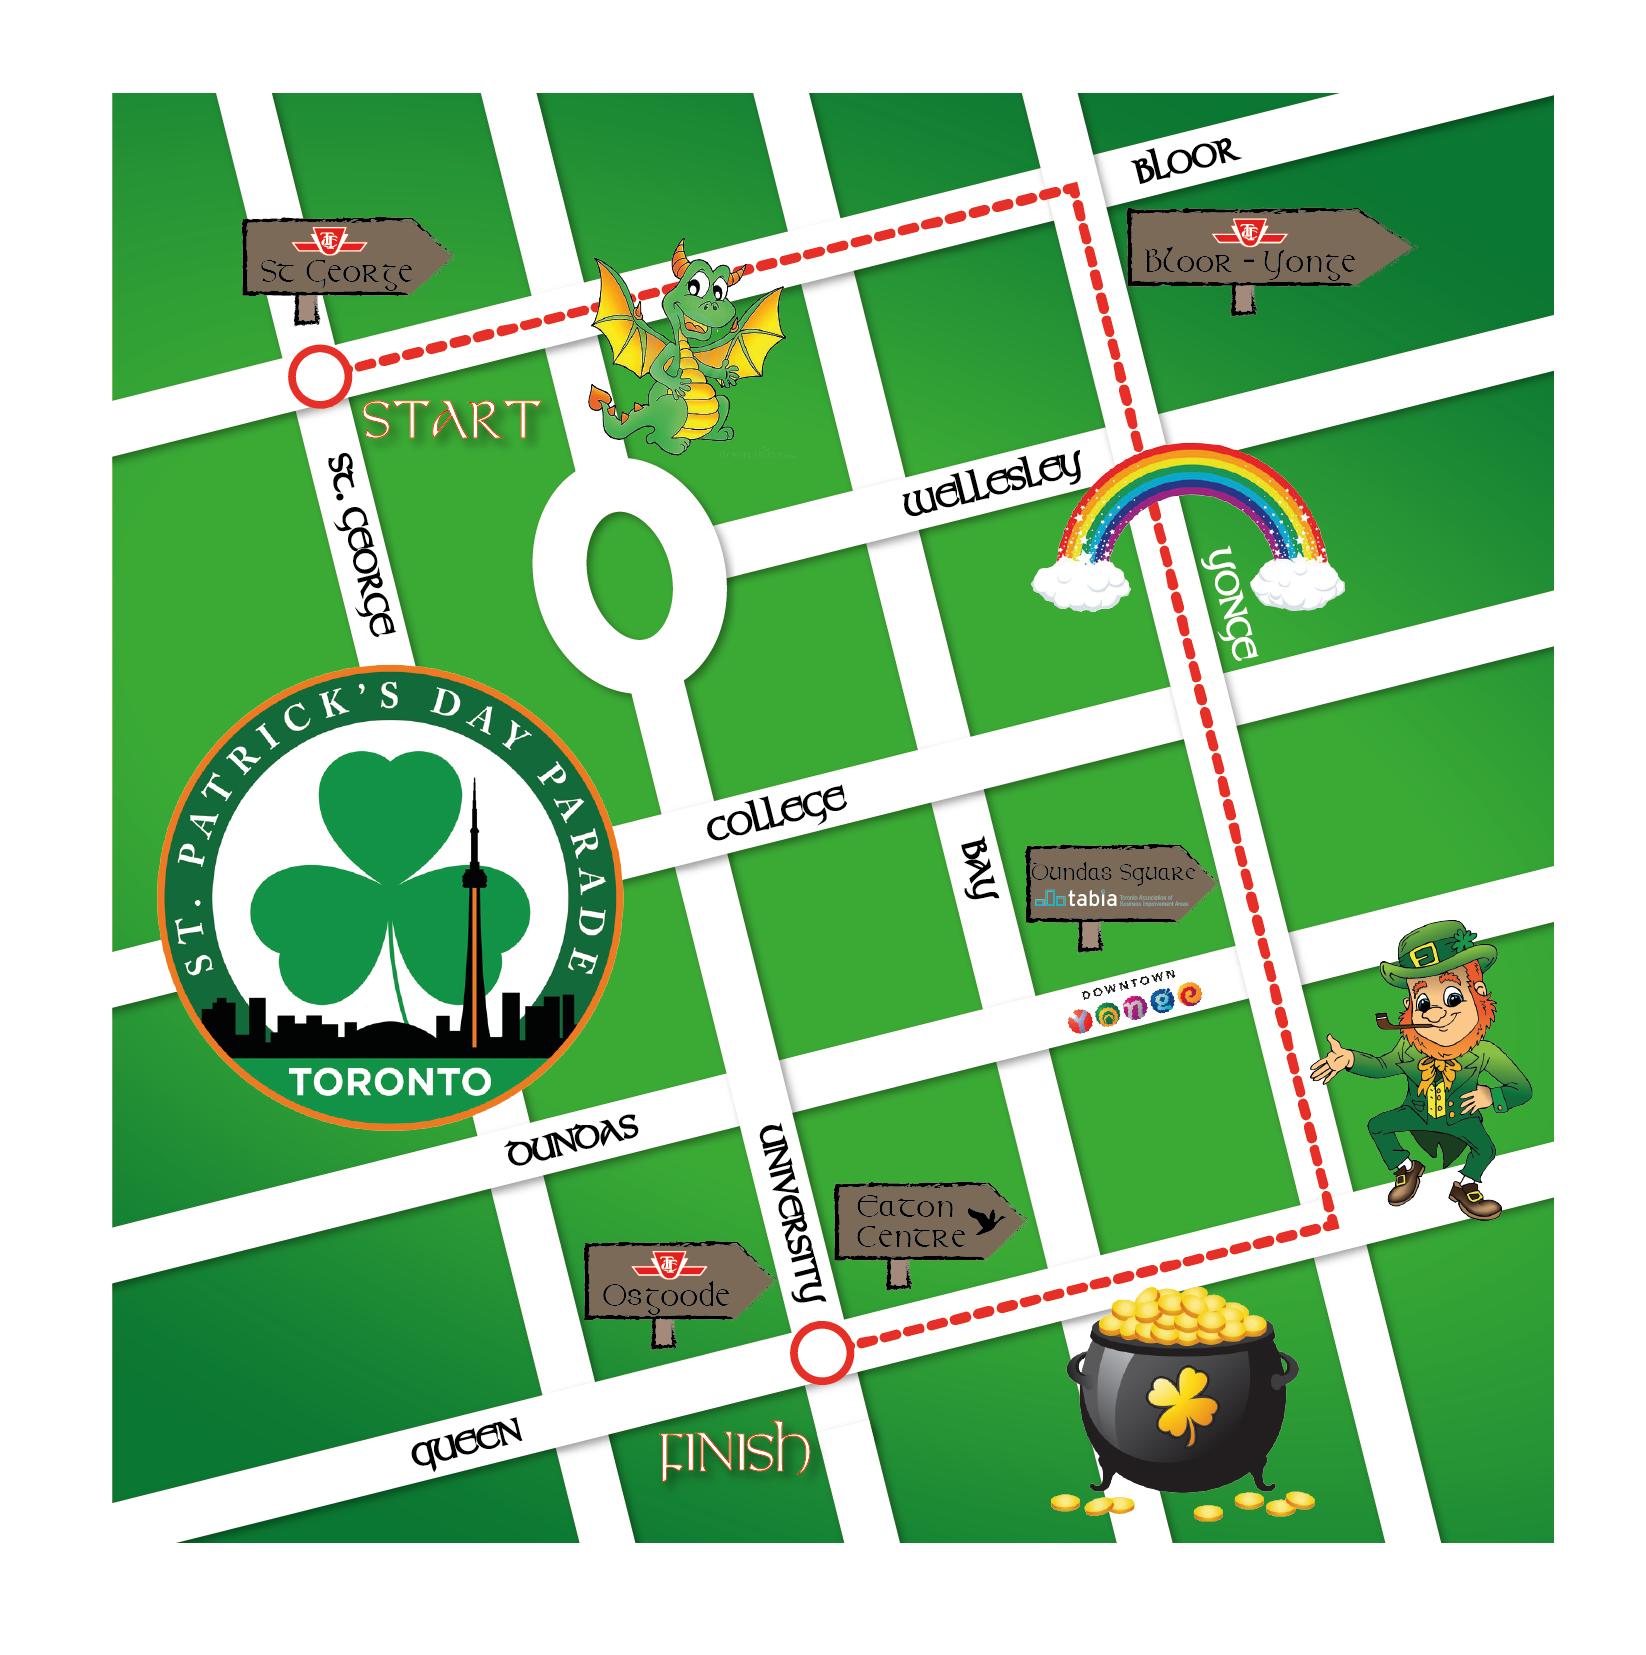 1646x1655 Parade Map St Patrick's Parade Toronto St Patrick's Parade Toronto